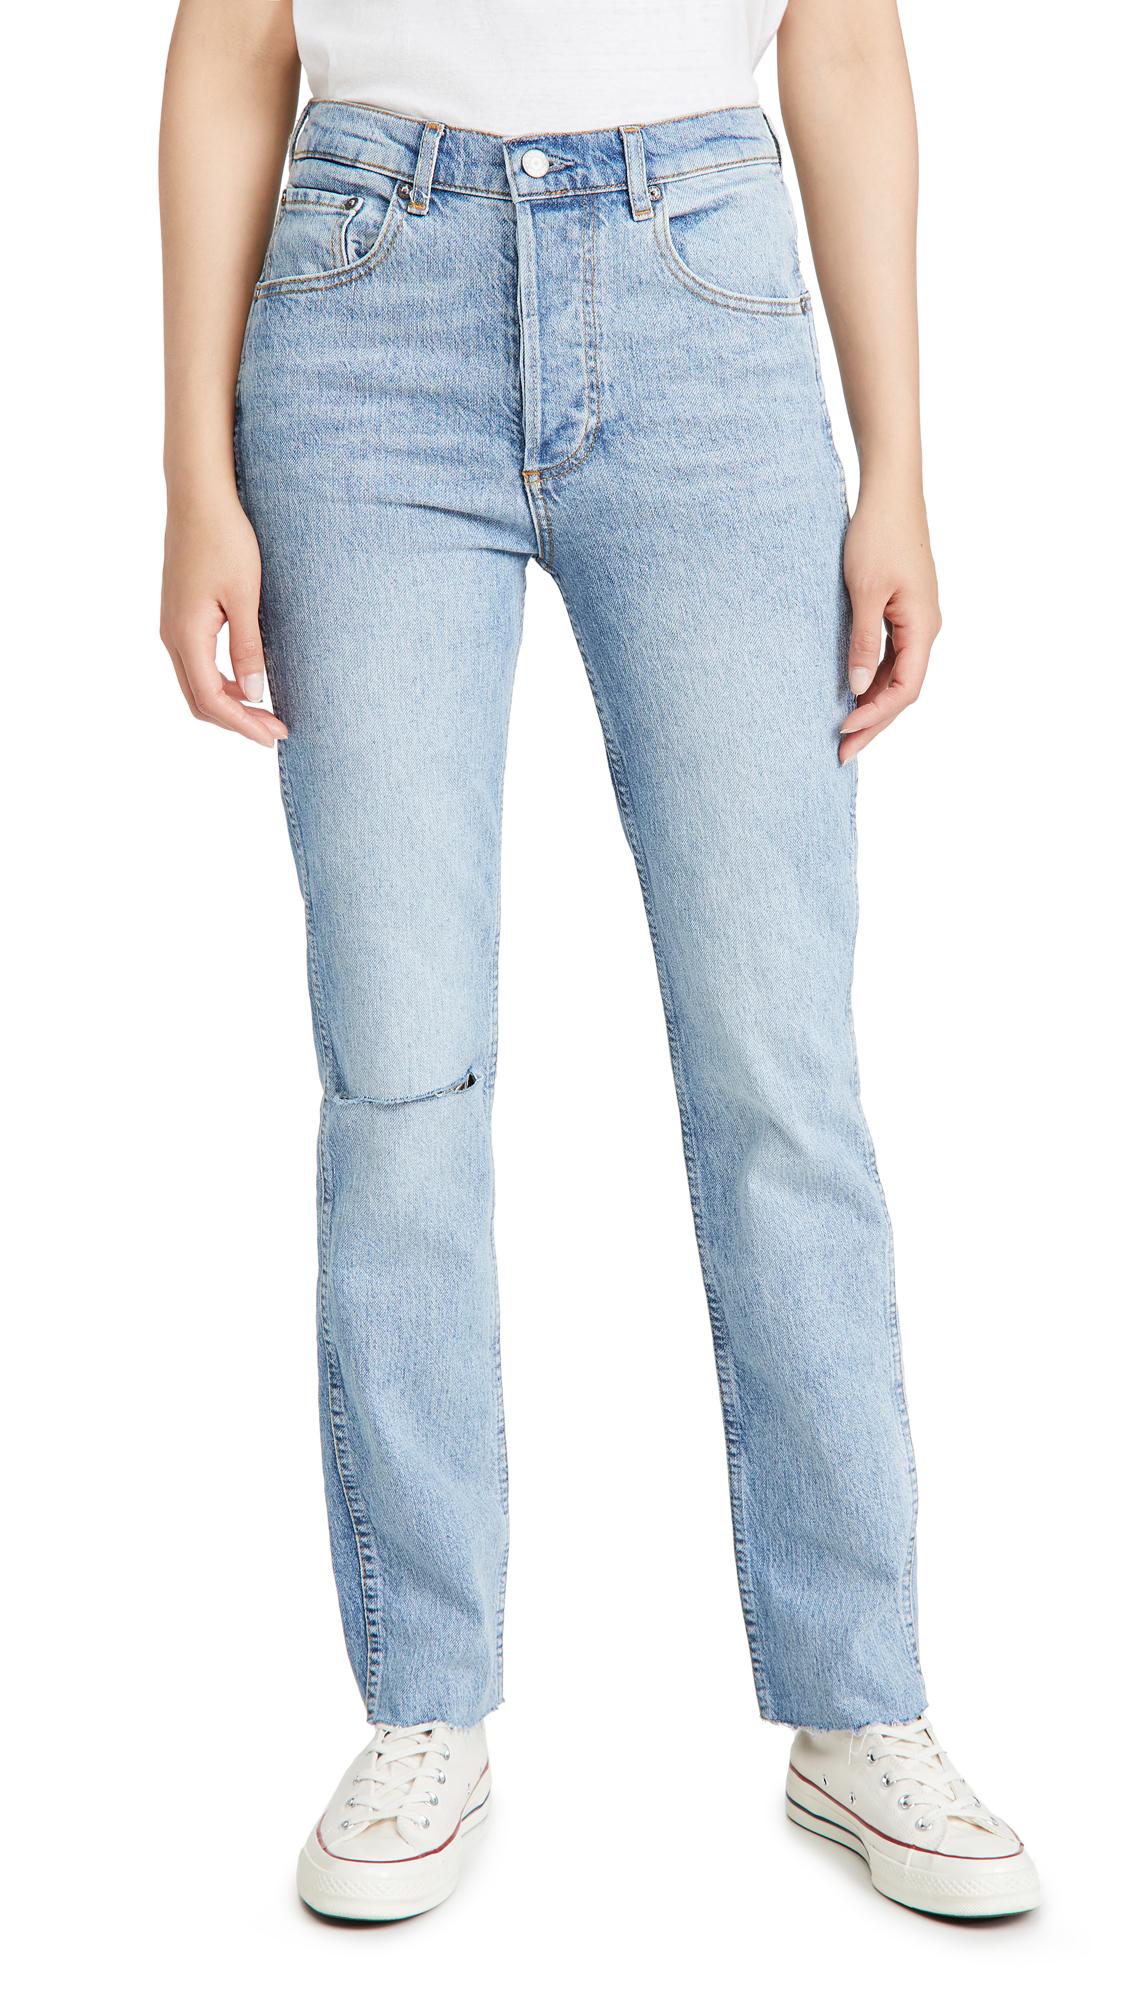 Boyish The Dempsey Jeans